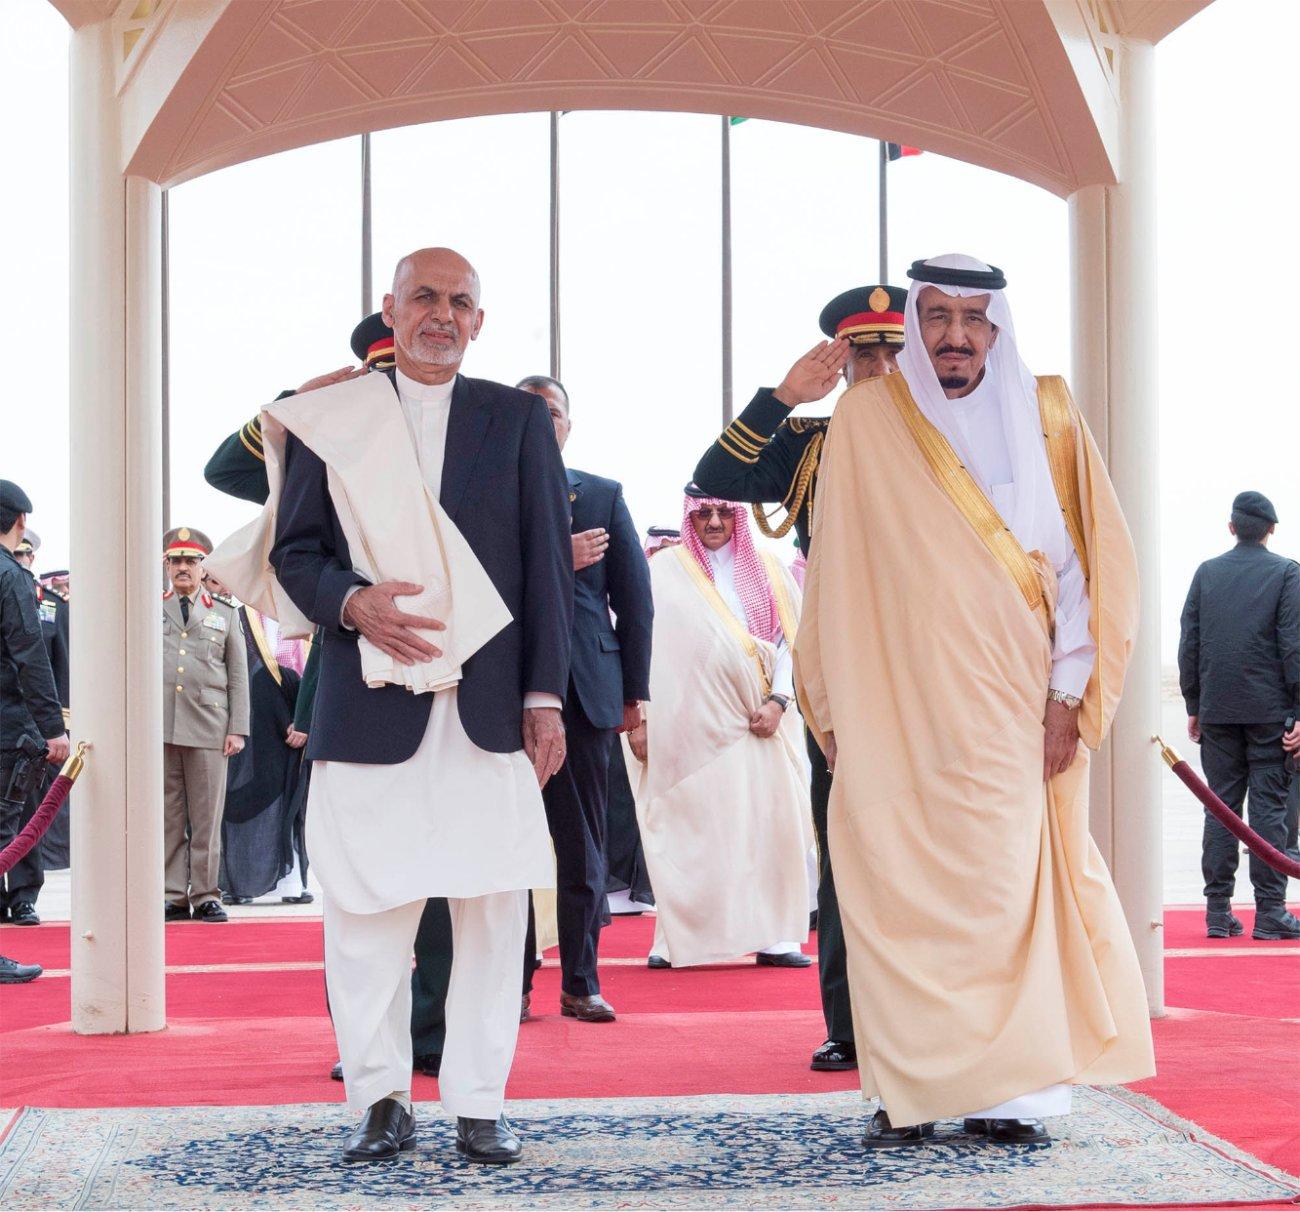 Saudi King Salman bin Abdulaziz al-Saud (R) and Afghanistan's President Ashraf Ghani (L) are seen during a welcoming ceremony at King Khaled International Airport in Riyadh. (SPA)